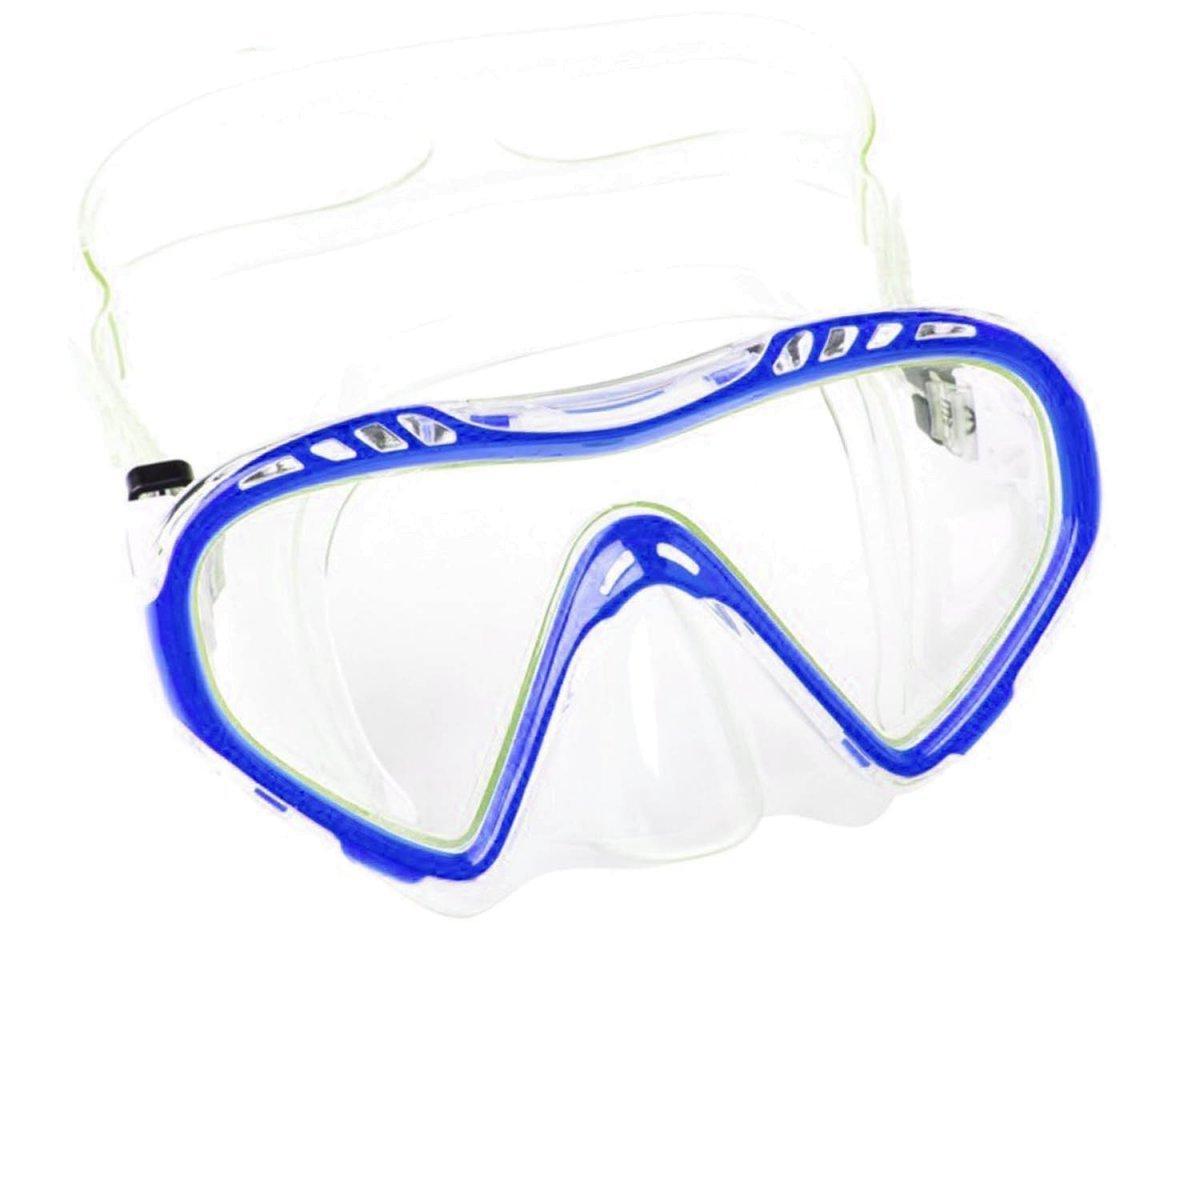 Маска для плавания Bestway 22050, размер M (6+), обхват головы ≈ 52 см, голубая